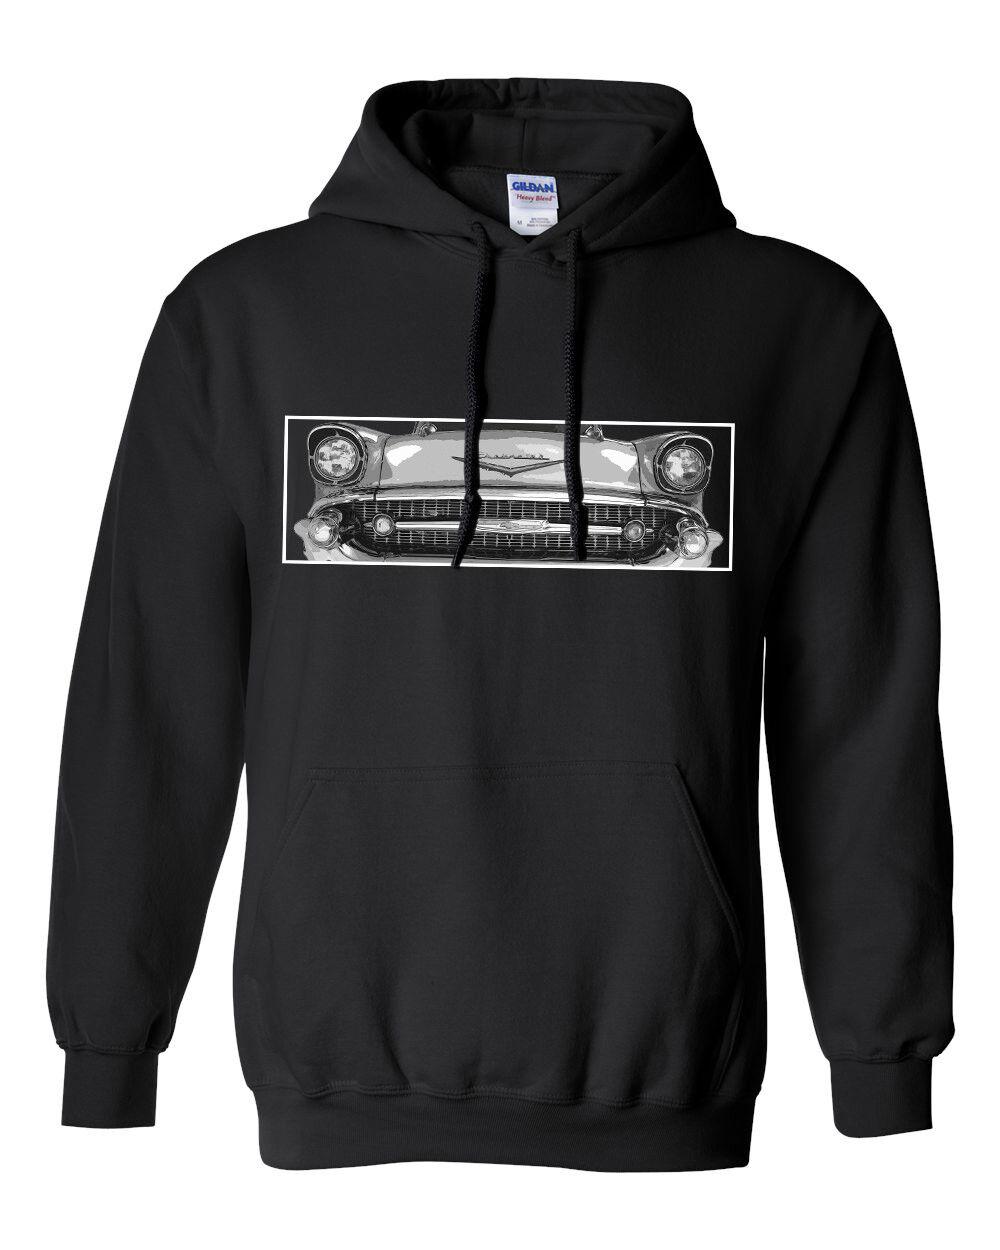 57 Chevy Bel Air Hoodie, 1957 Chevrolet Car Sweatshirt, Car Enthusiast Apperal